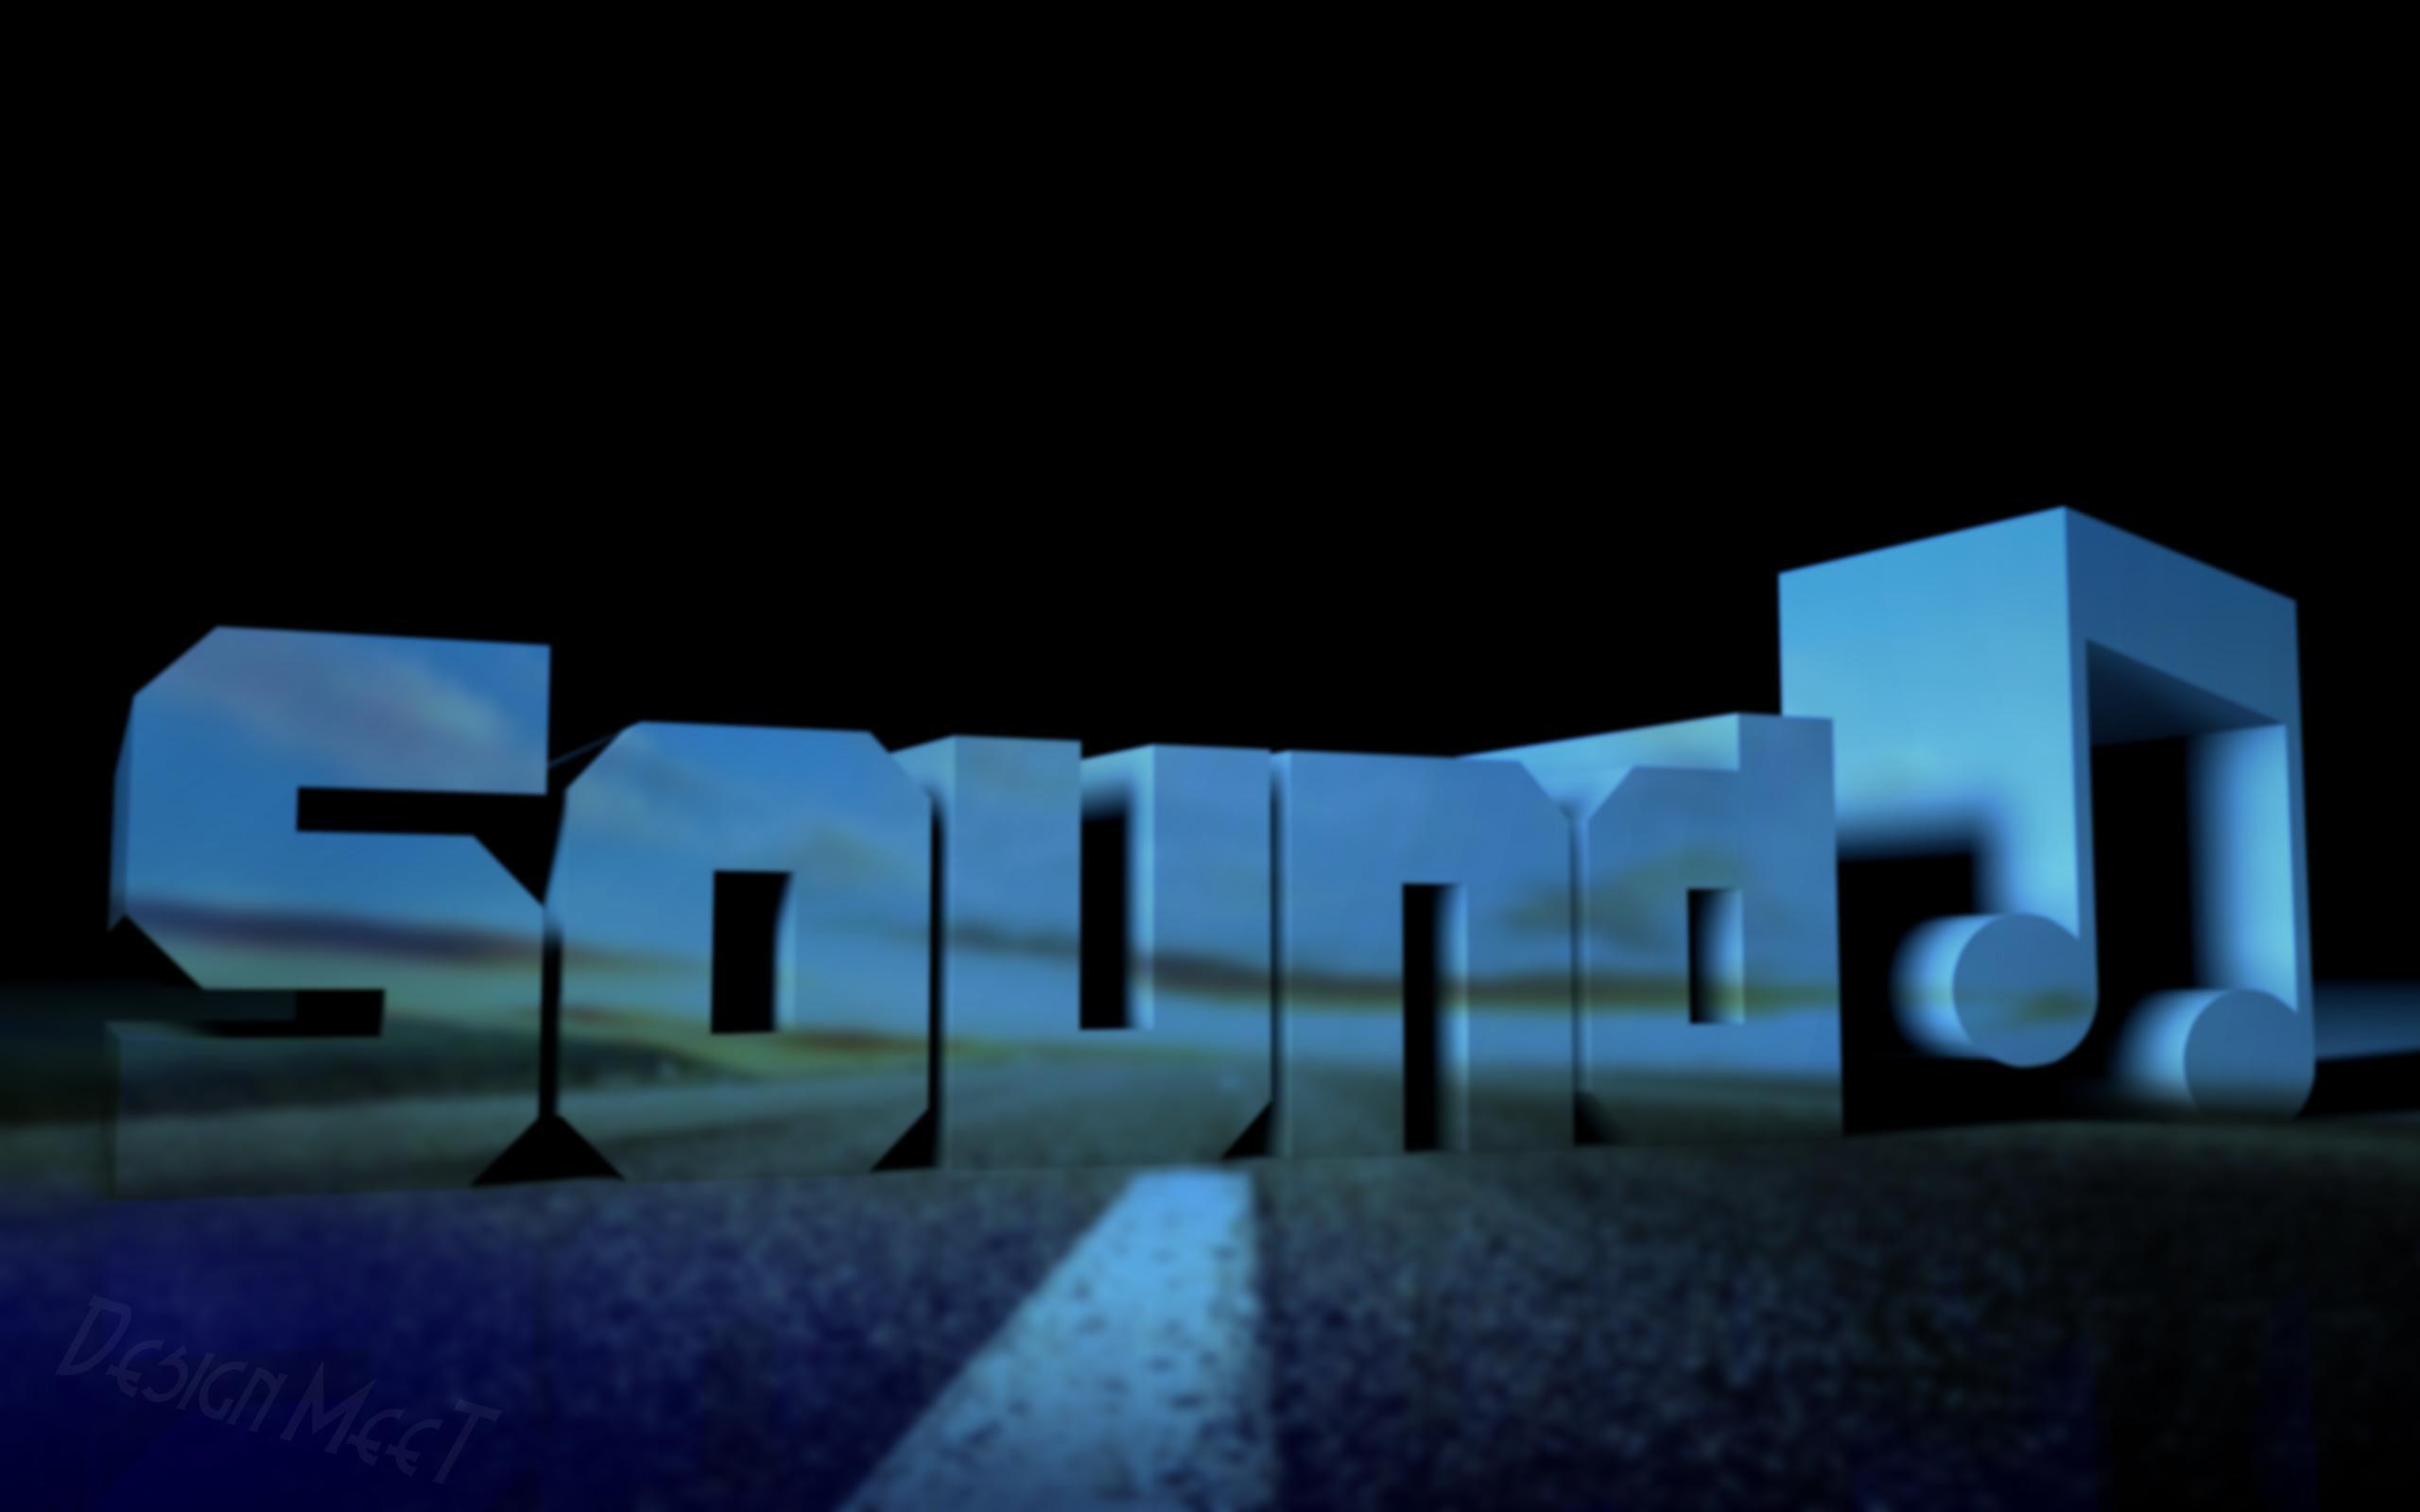 Sound Blue wallpapers Sound Blue stock photos 2560x1600